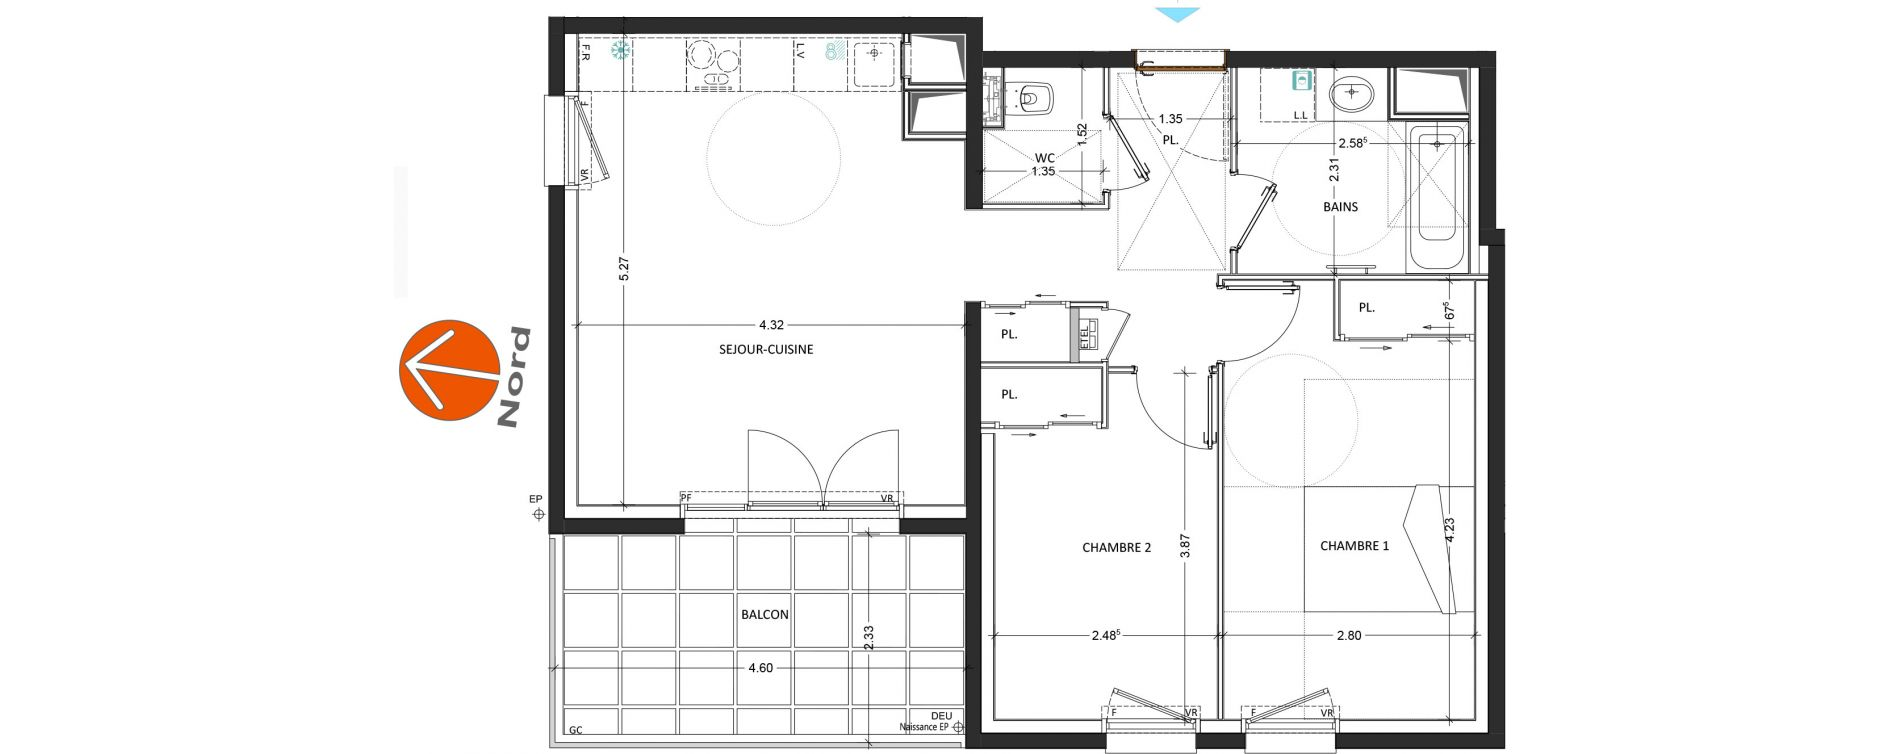 Appartement T3 de 59,09 m2 à Annecy Annecy seynod